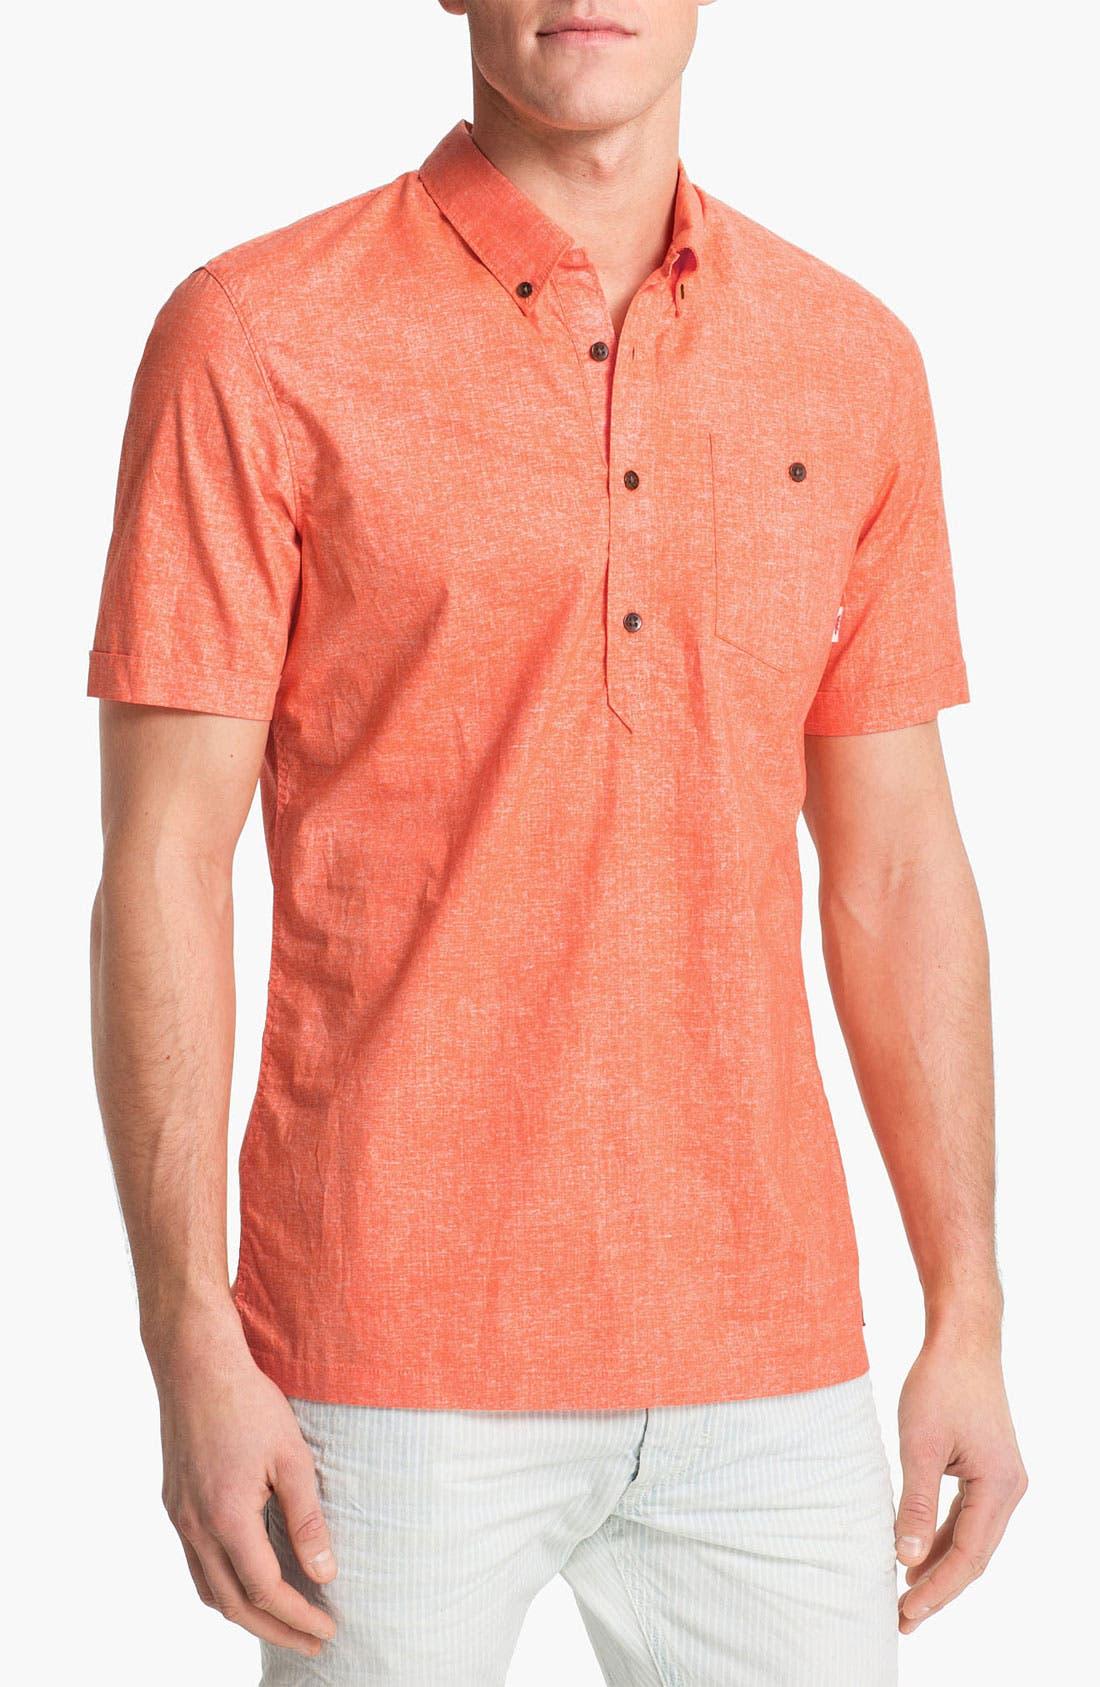 Main Image - Vans 'Redding' Pullover Woven Shirt